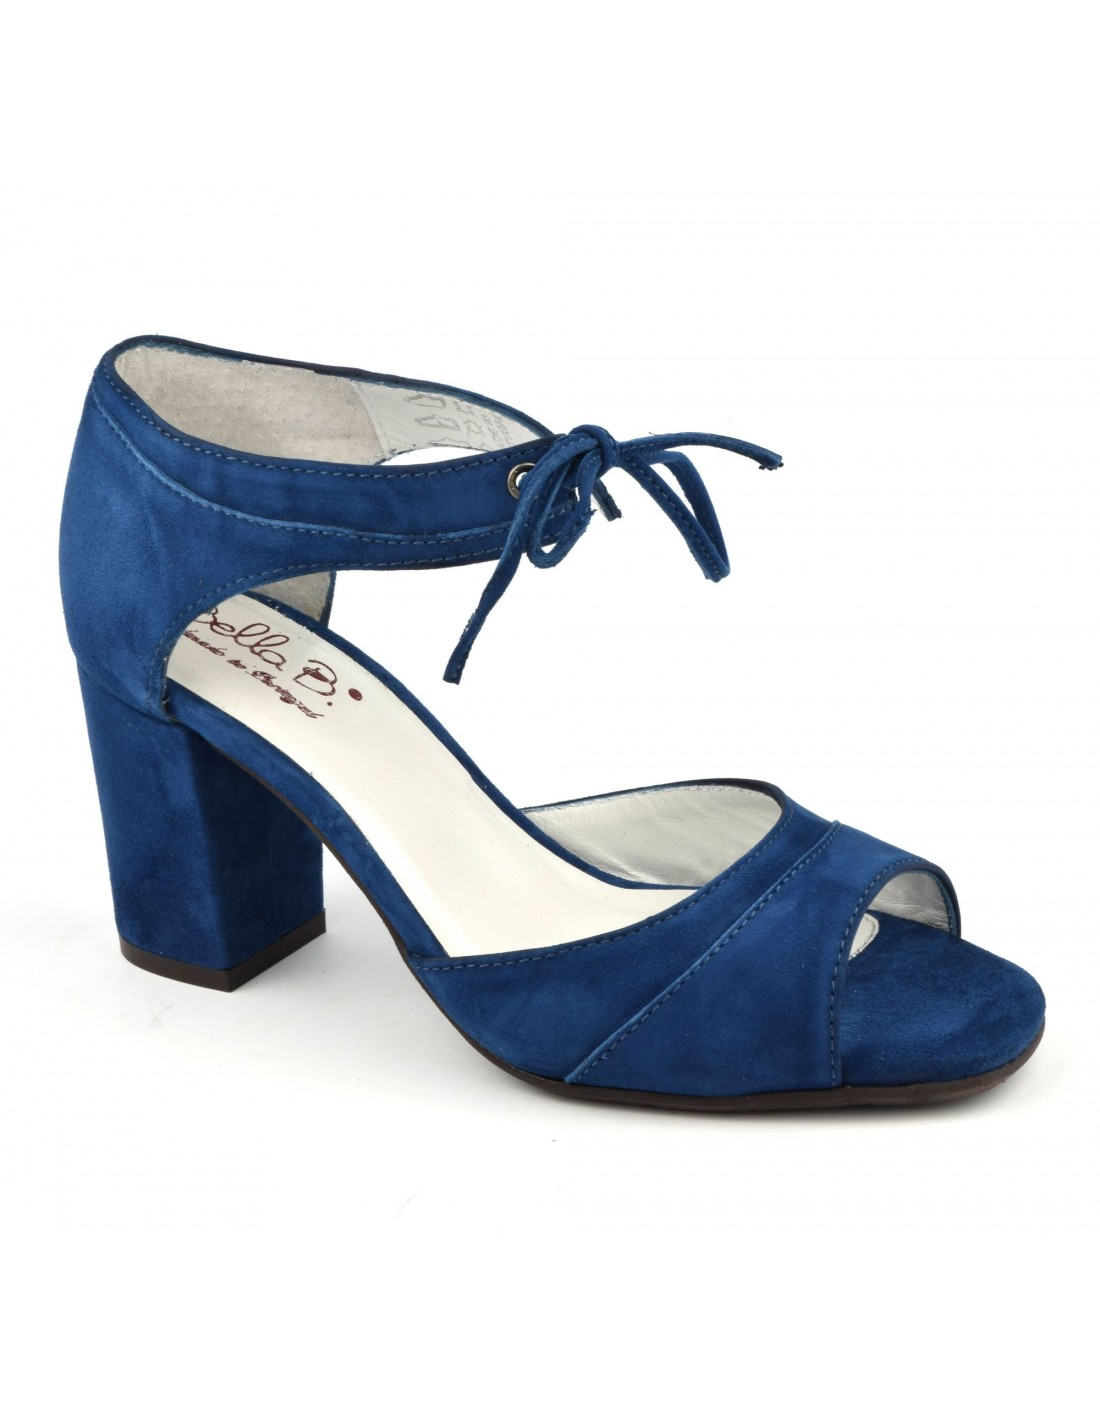 Lacets Sandales RoyalTalons Daim CarrésBlauBella Cuir Bleu B iXuPkZOTw